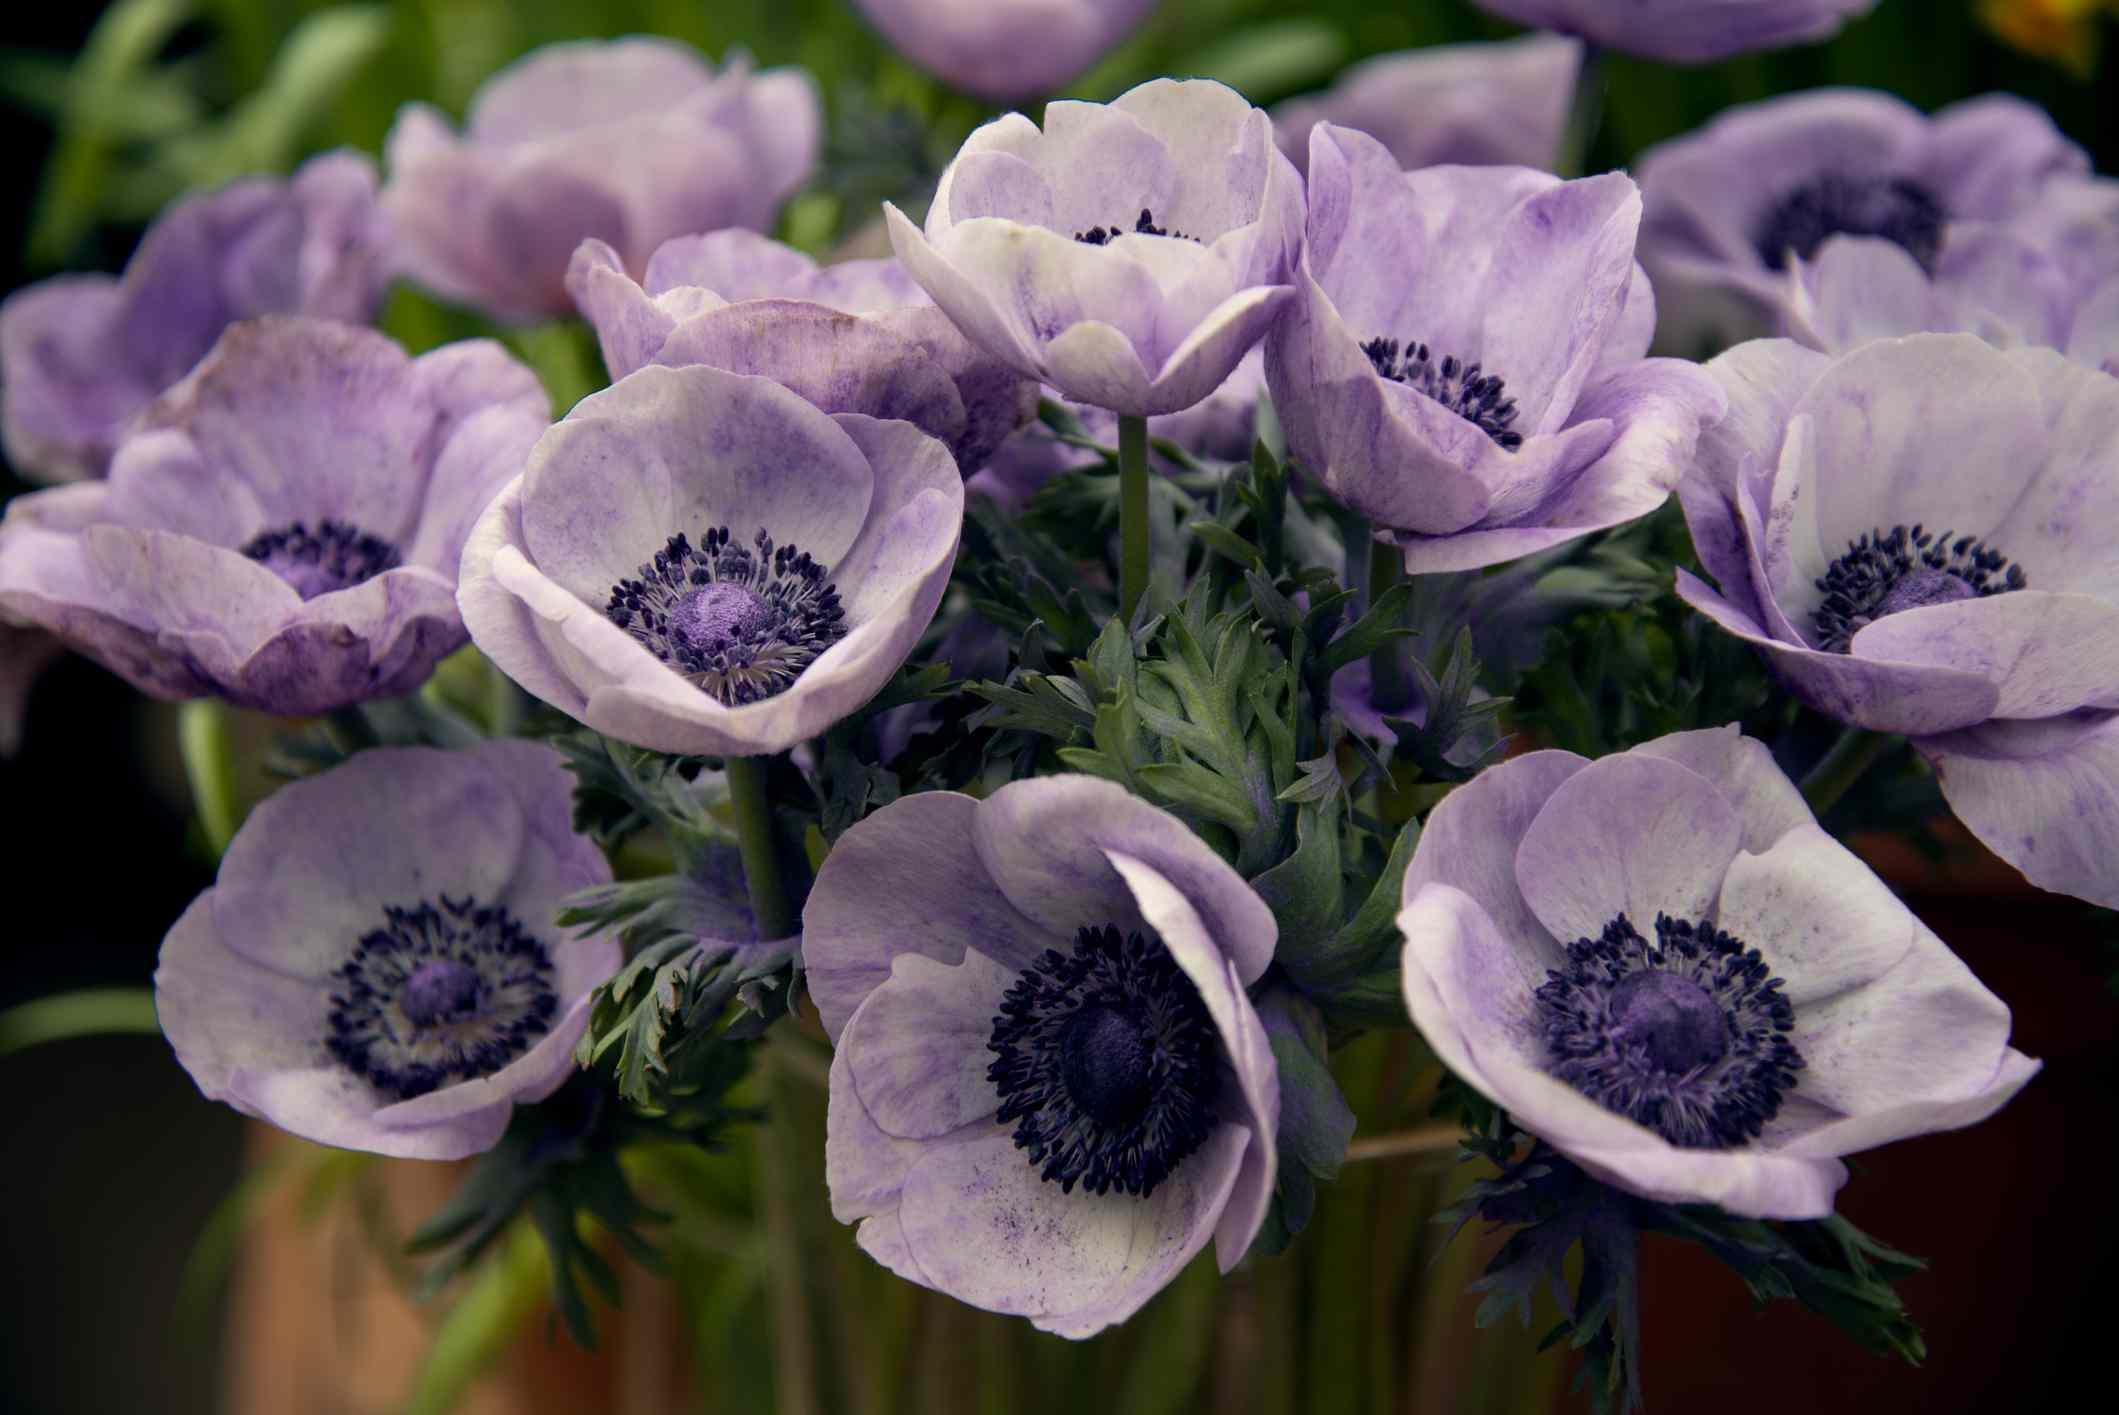 Purple Anemone flower bouquet